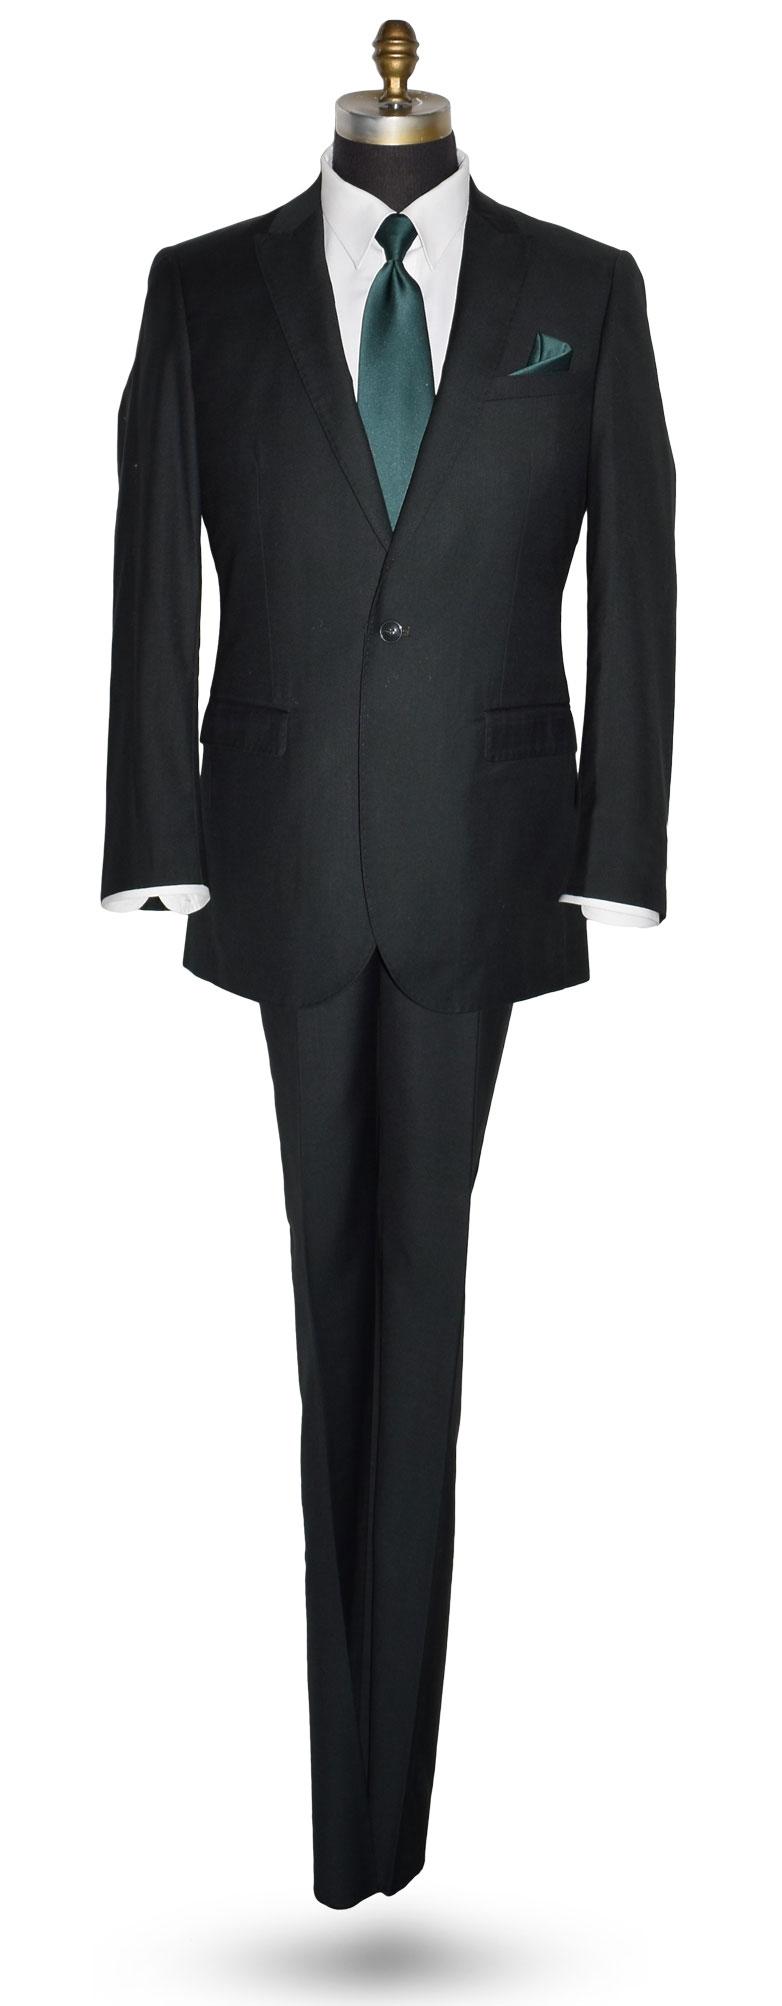 Hunter Green Tuxedo Coat and Pants Set